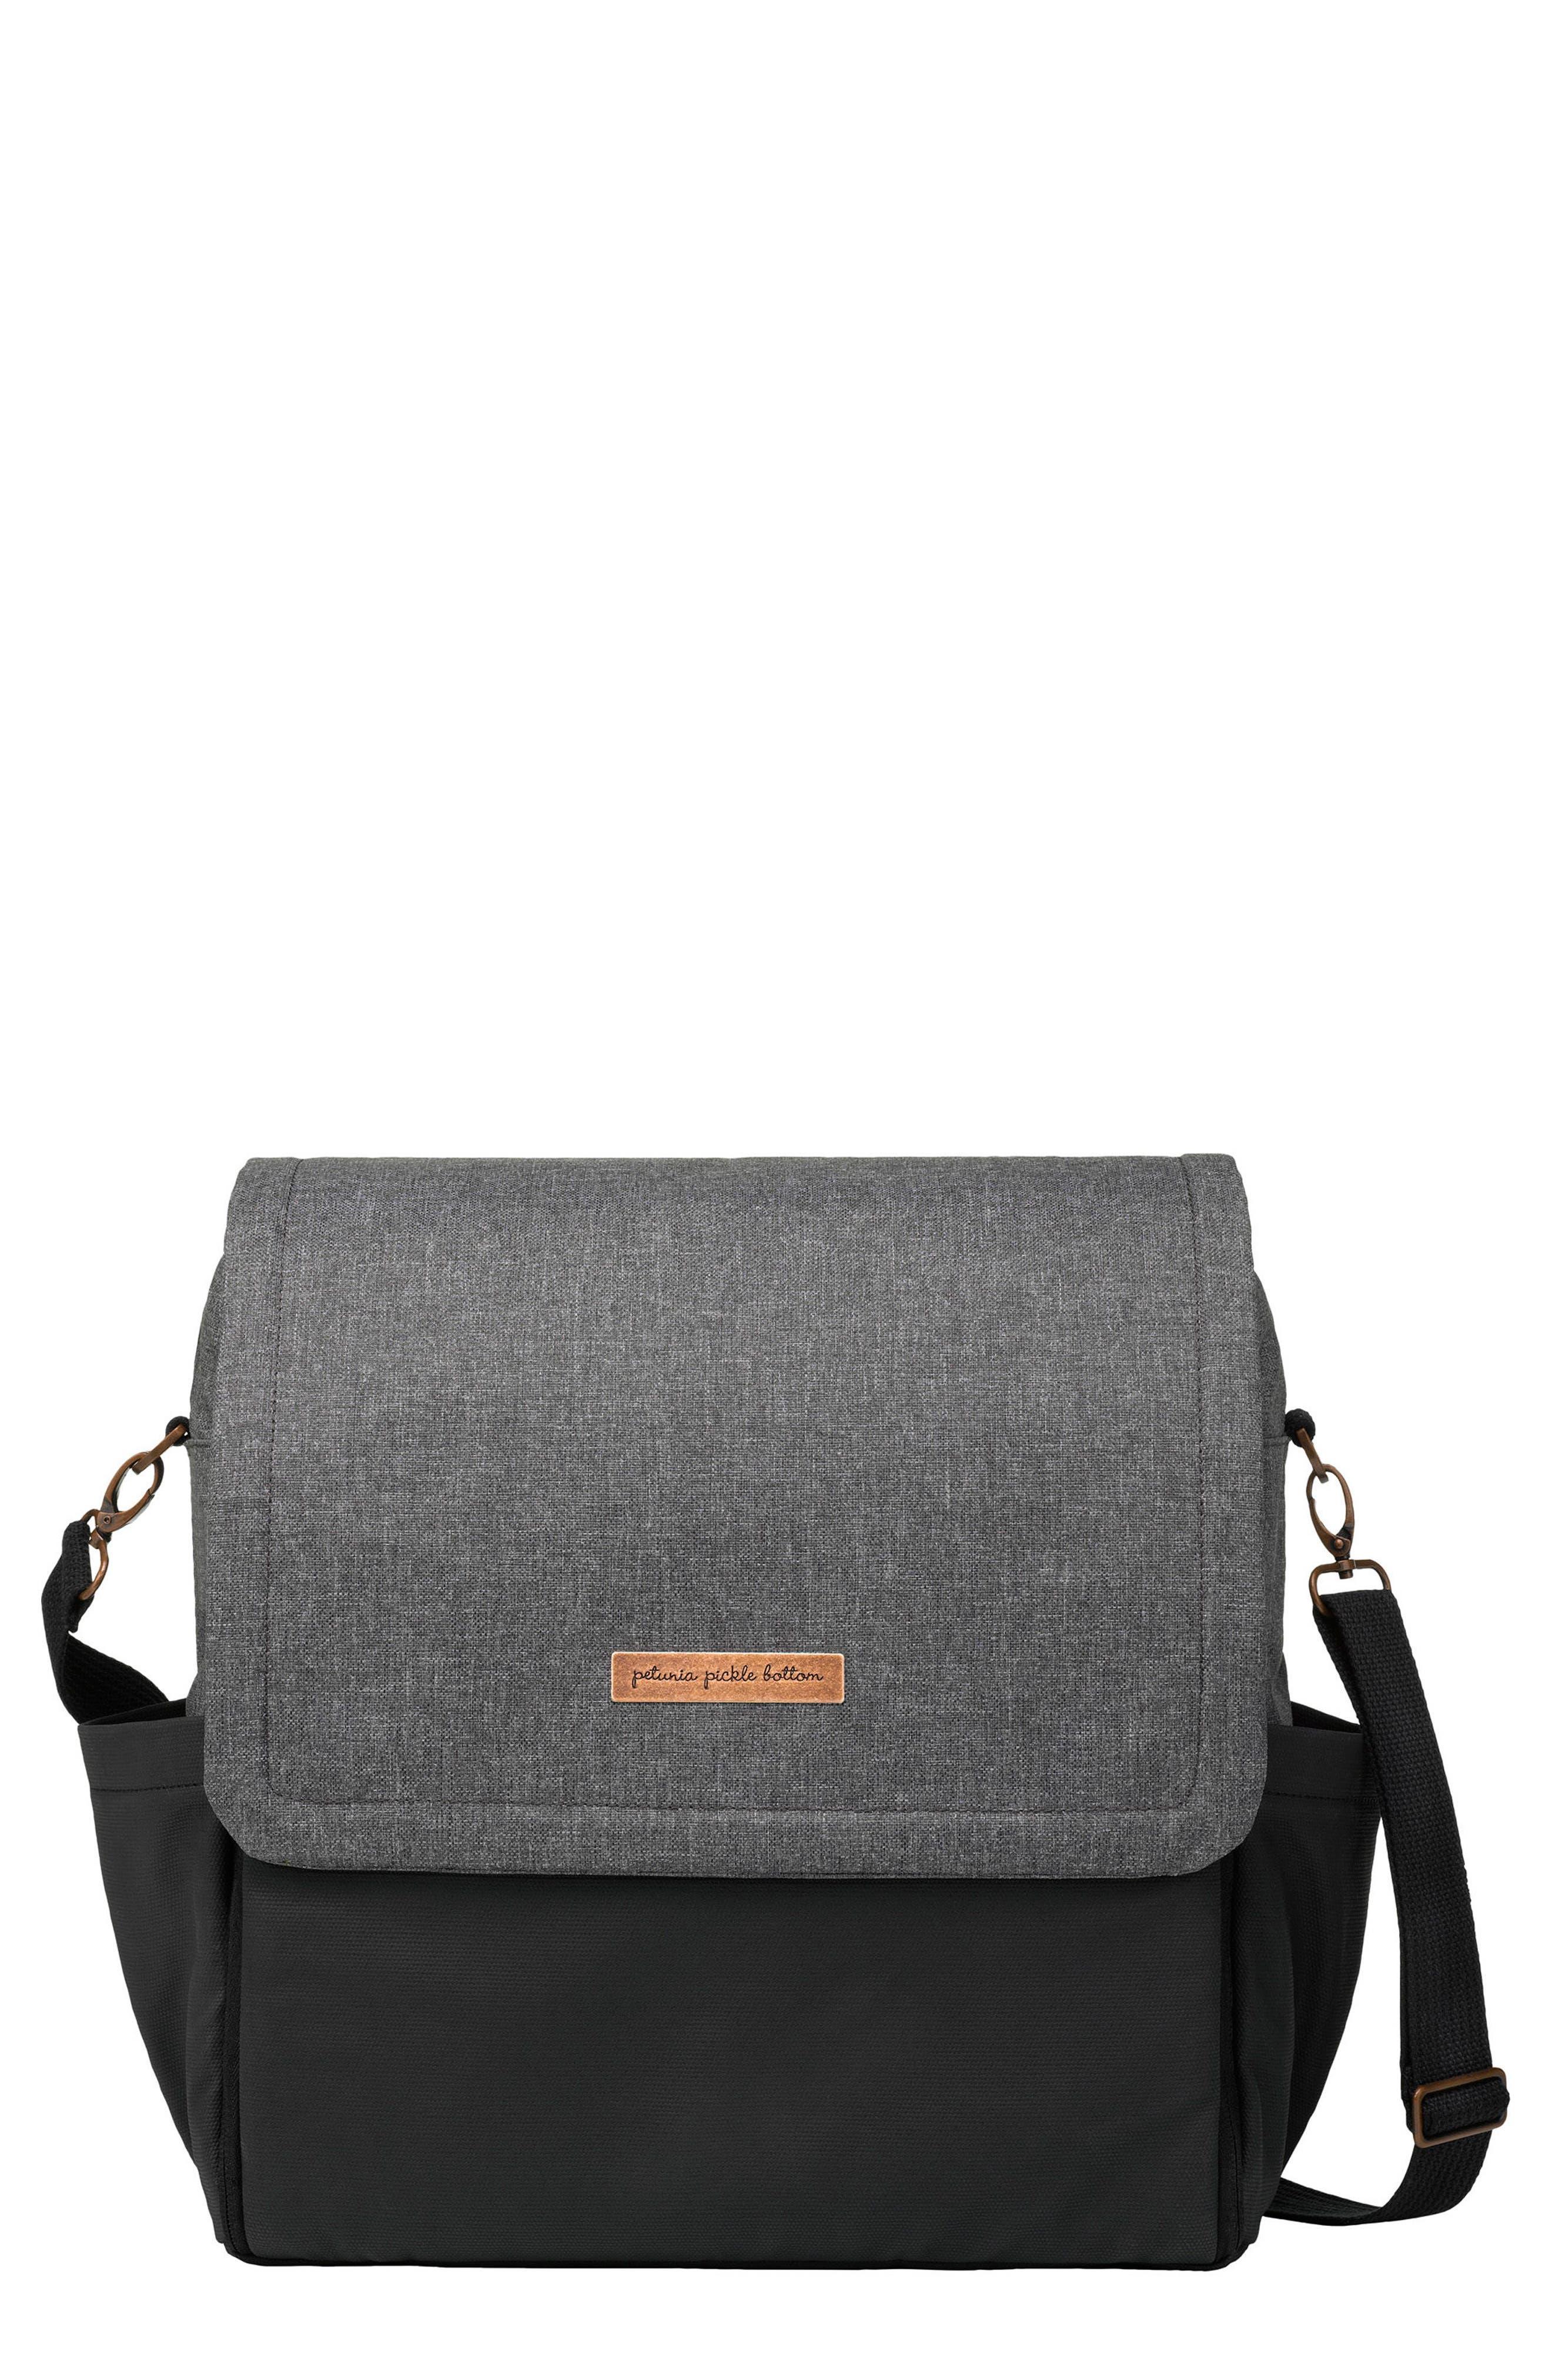 PETUNIA PICKLE BOTTOM, Boxy Backpack Diaper Bag, Main thumbnail 1, color, GRAPHITE/ BLACK